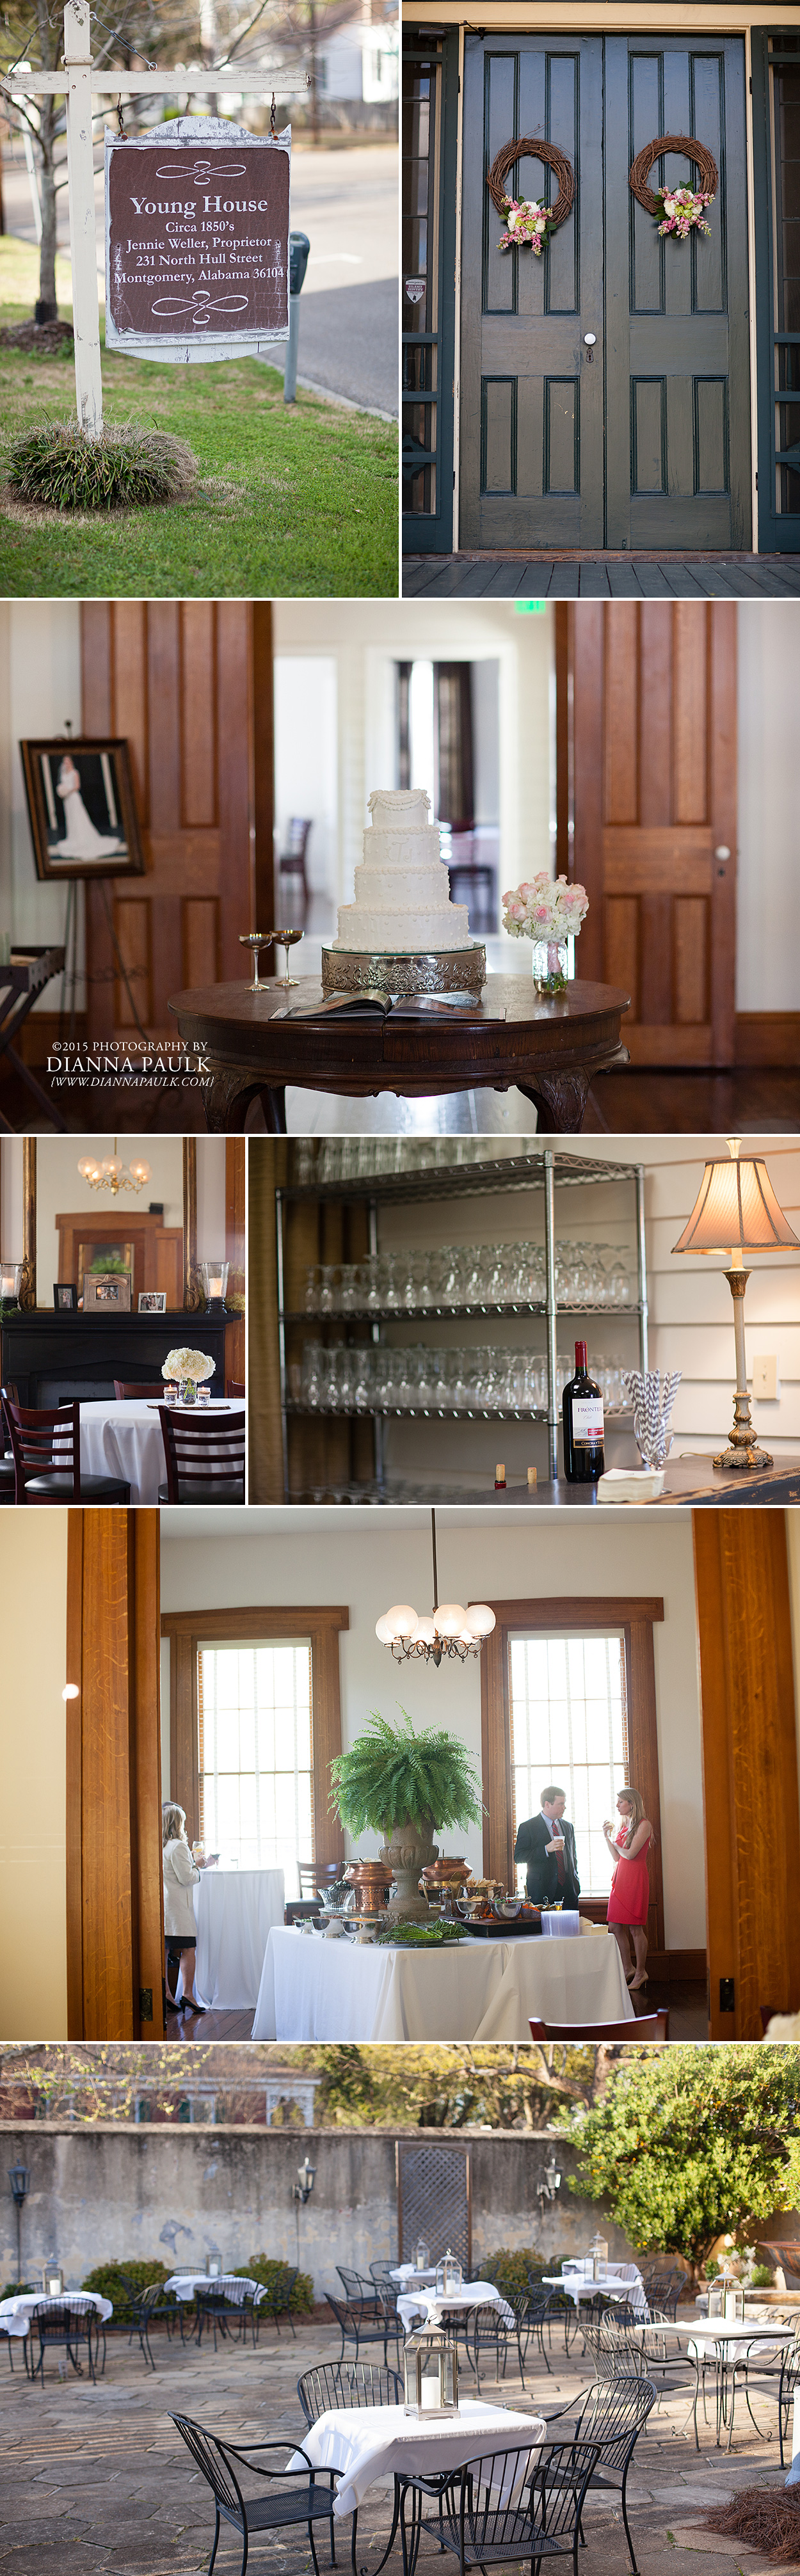 Wedding Reception Venue In Montgomery Al Young House Jennie Weller Proprietor